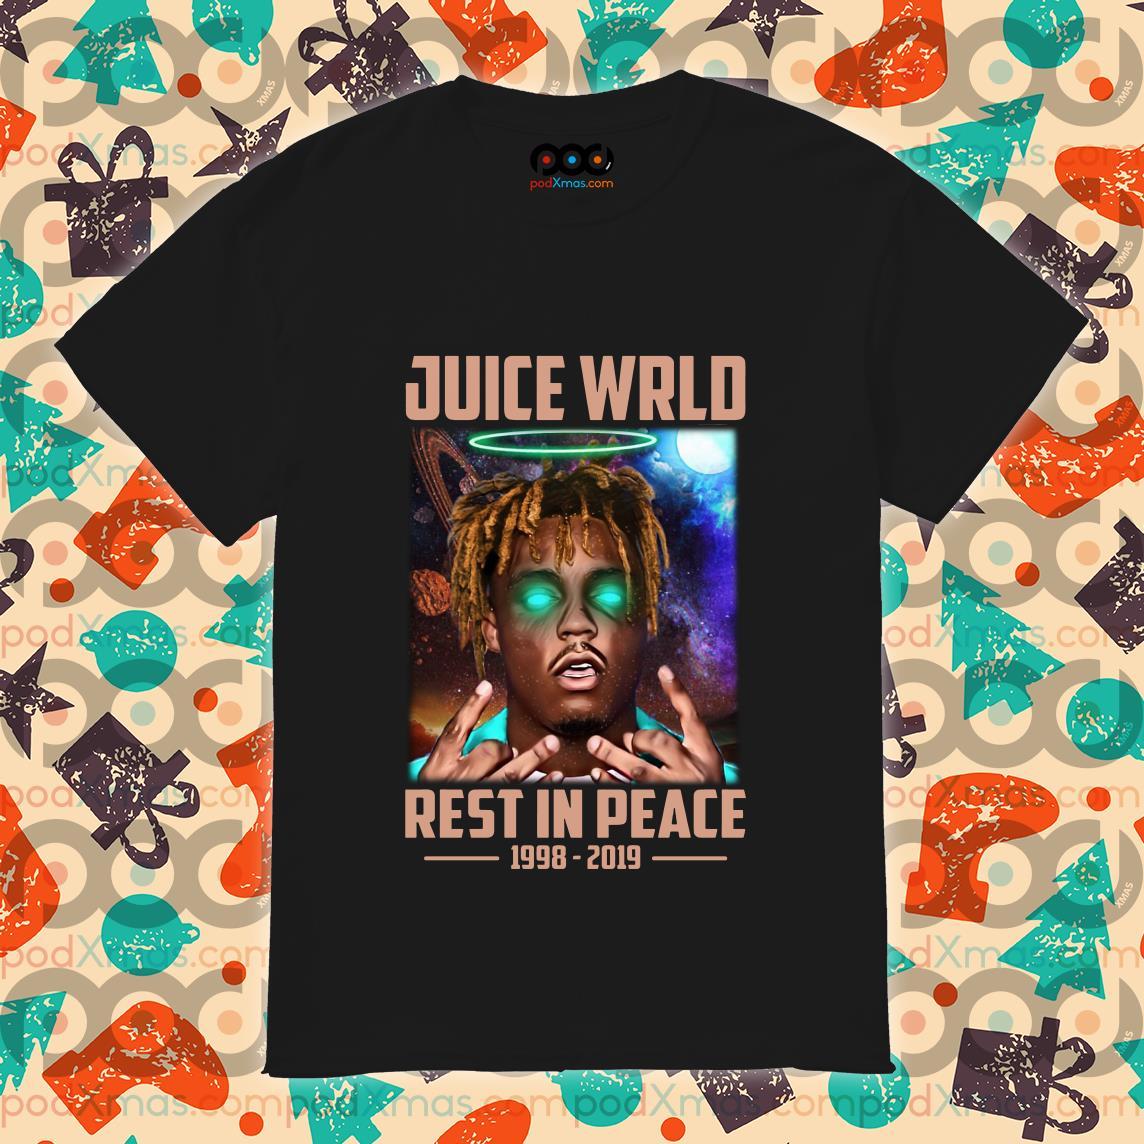 Juice Wrld Rest In Peace 1998 2019 shirt